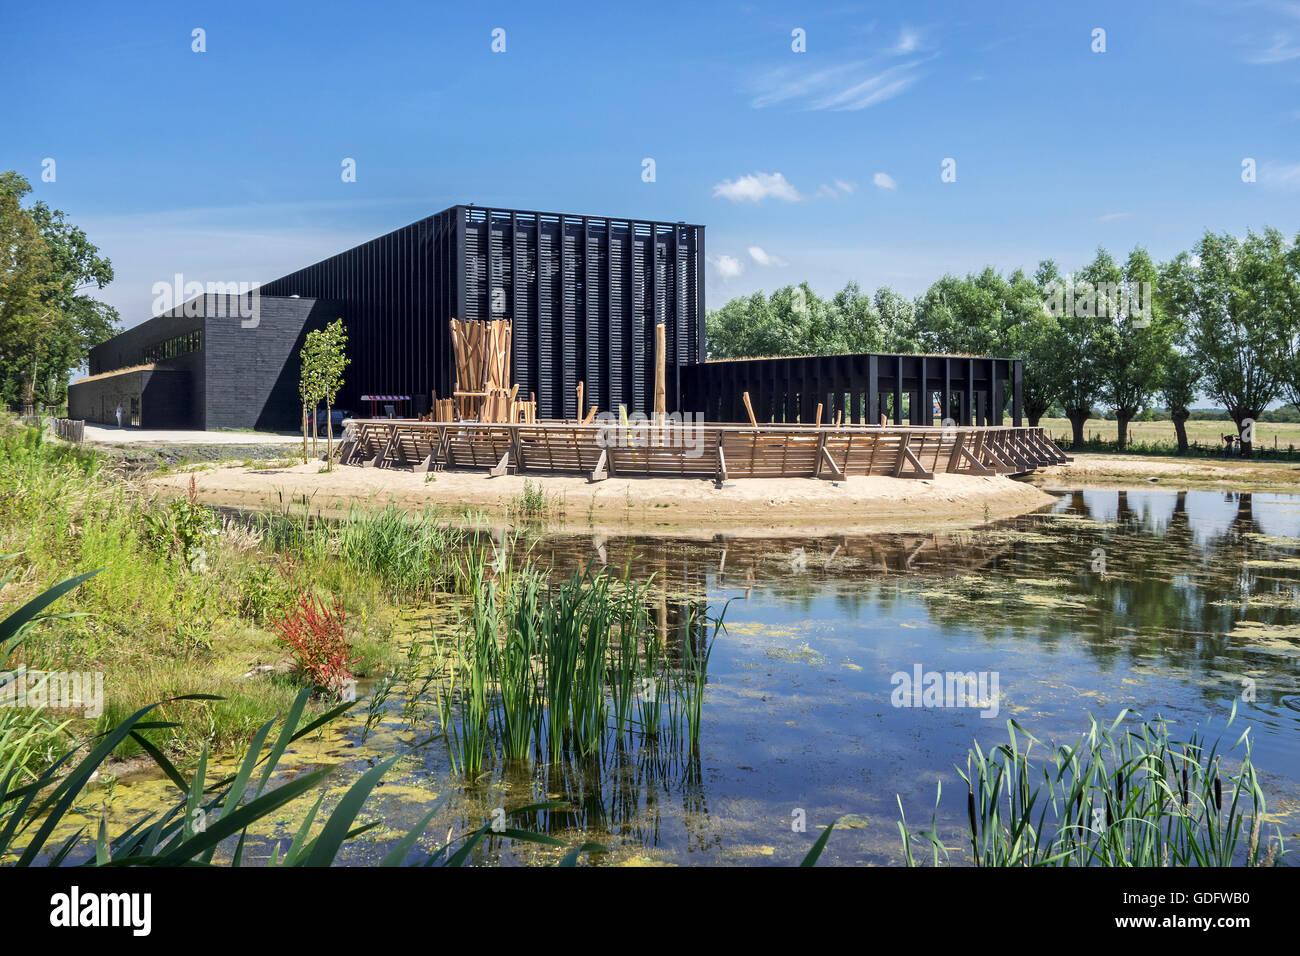 Flanders Nature Center